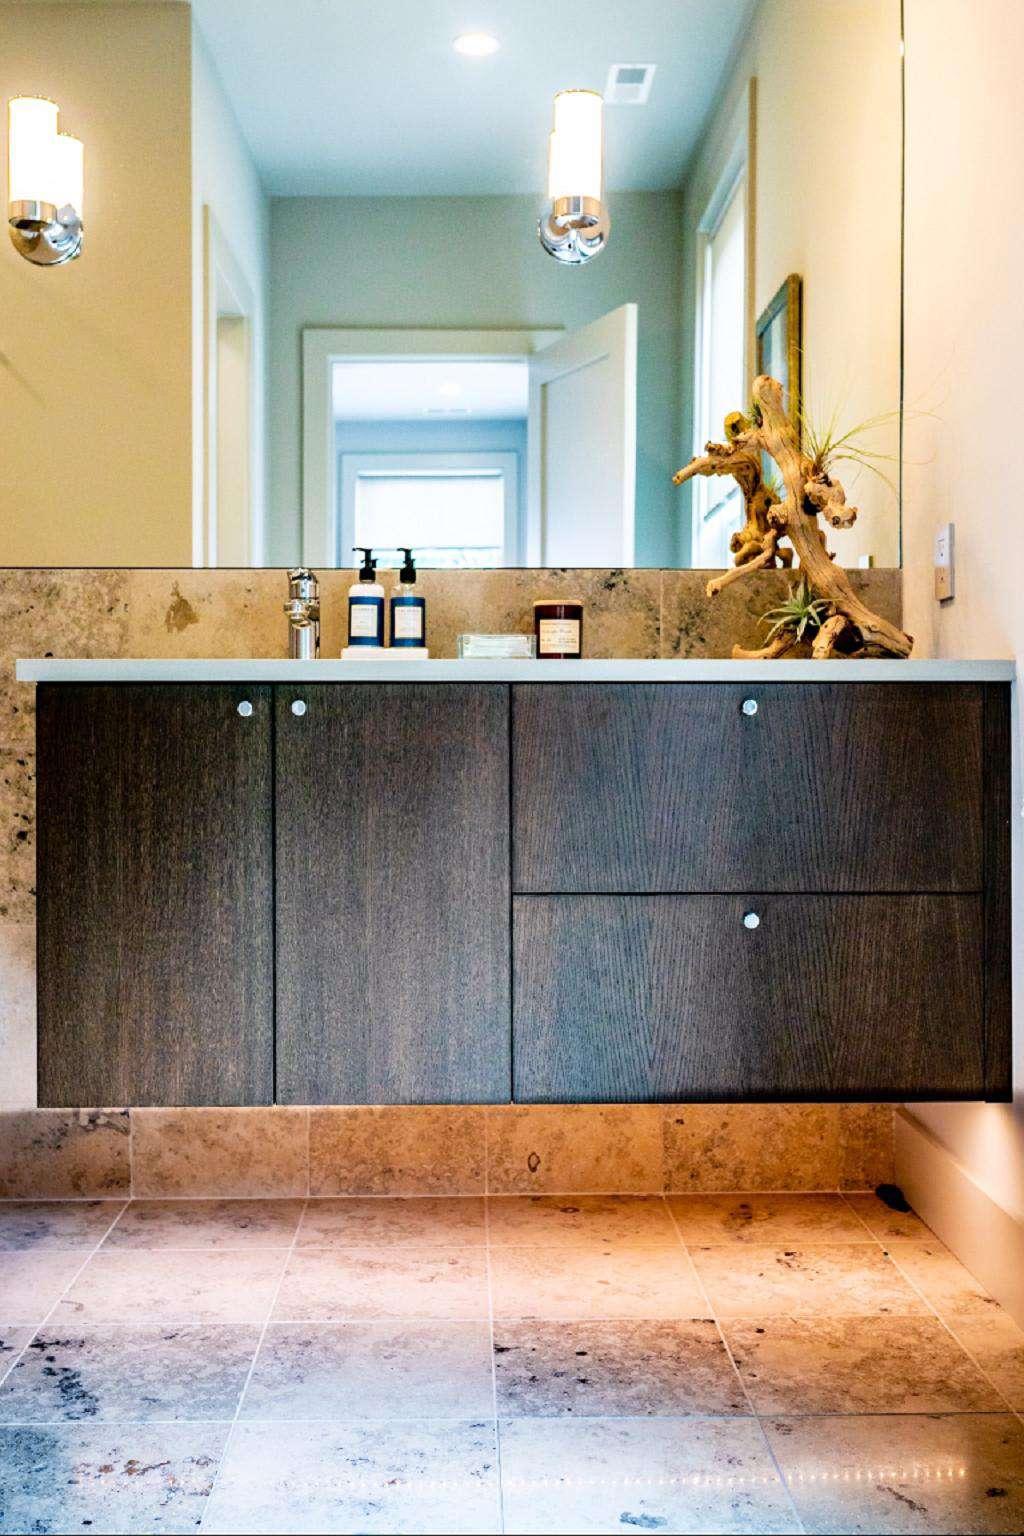 Spa-inspired en-suite bathroom design with tropical rain showerhead and luxury bath amenities.